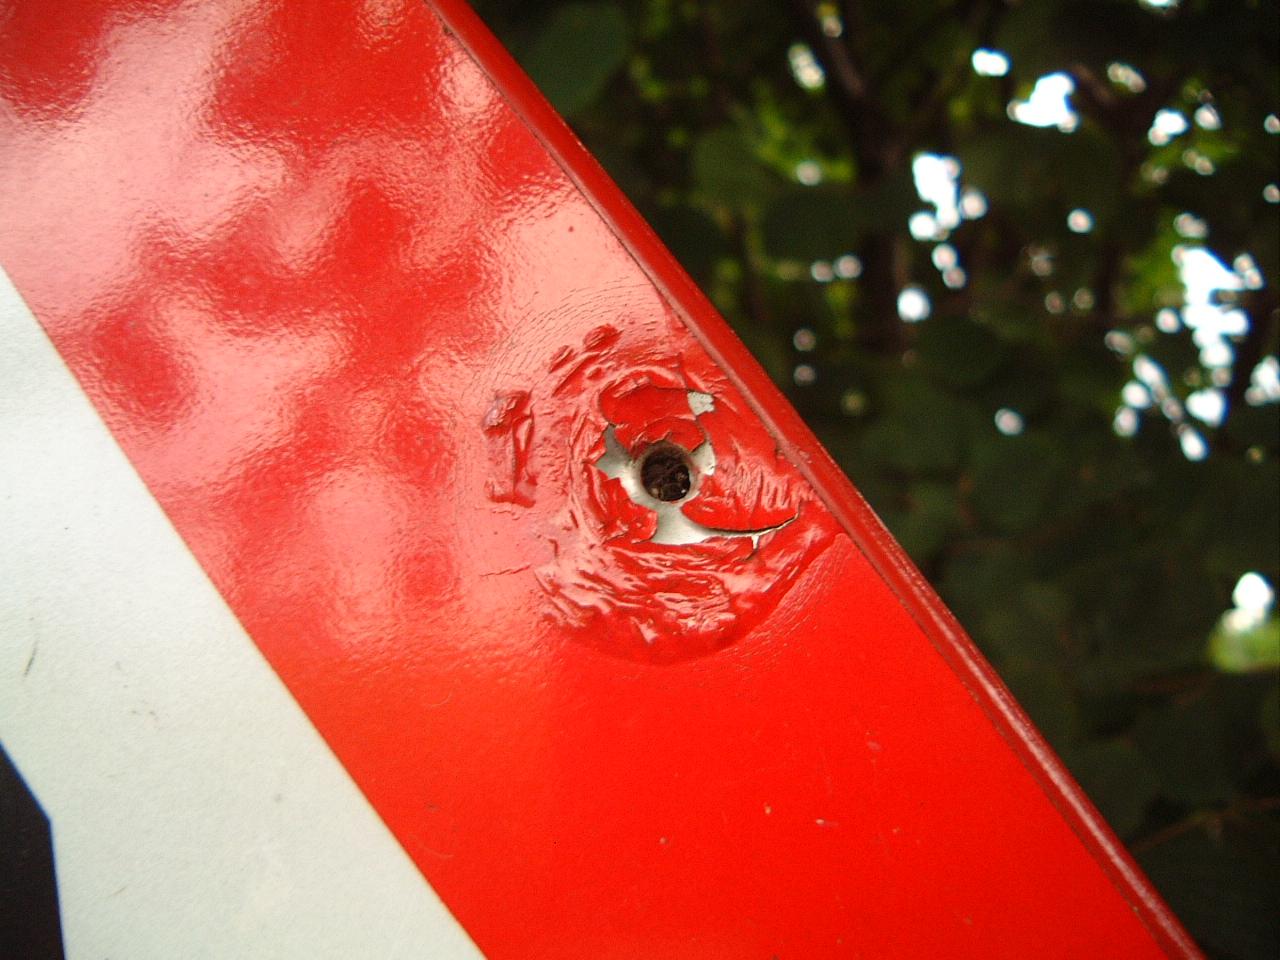 maartent bullethole hole trafficsign sign